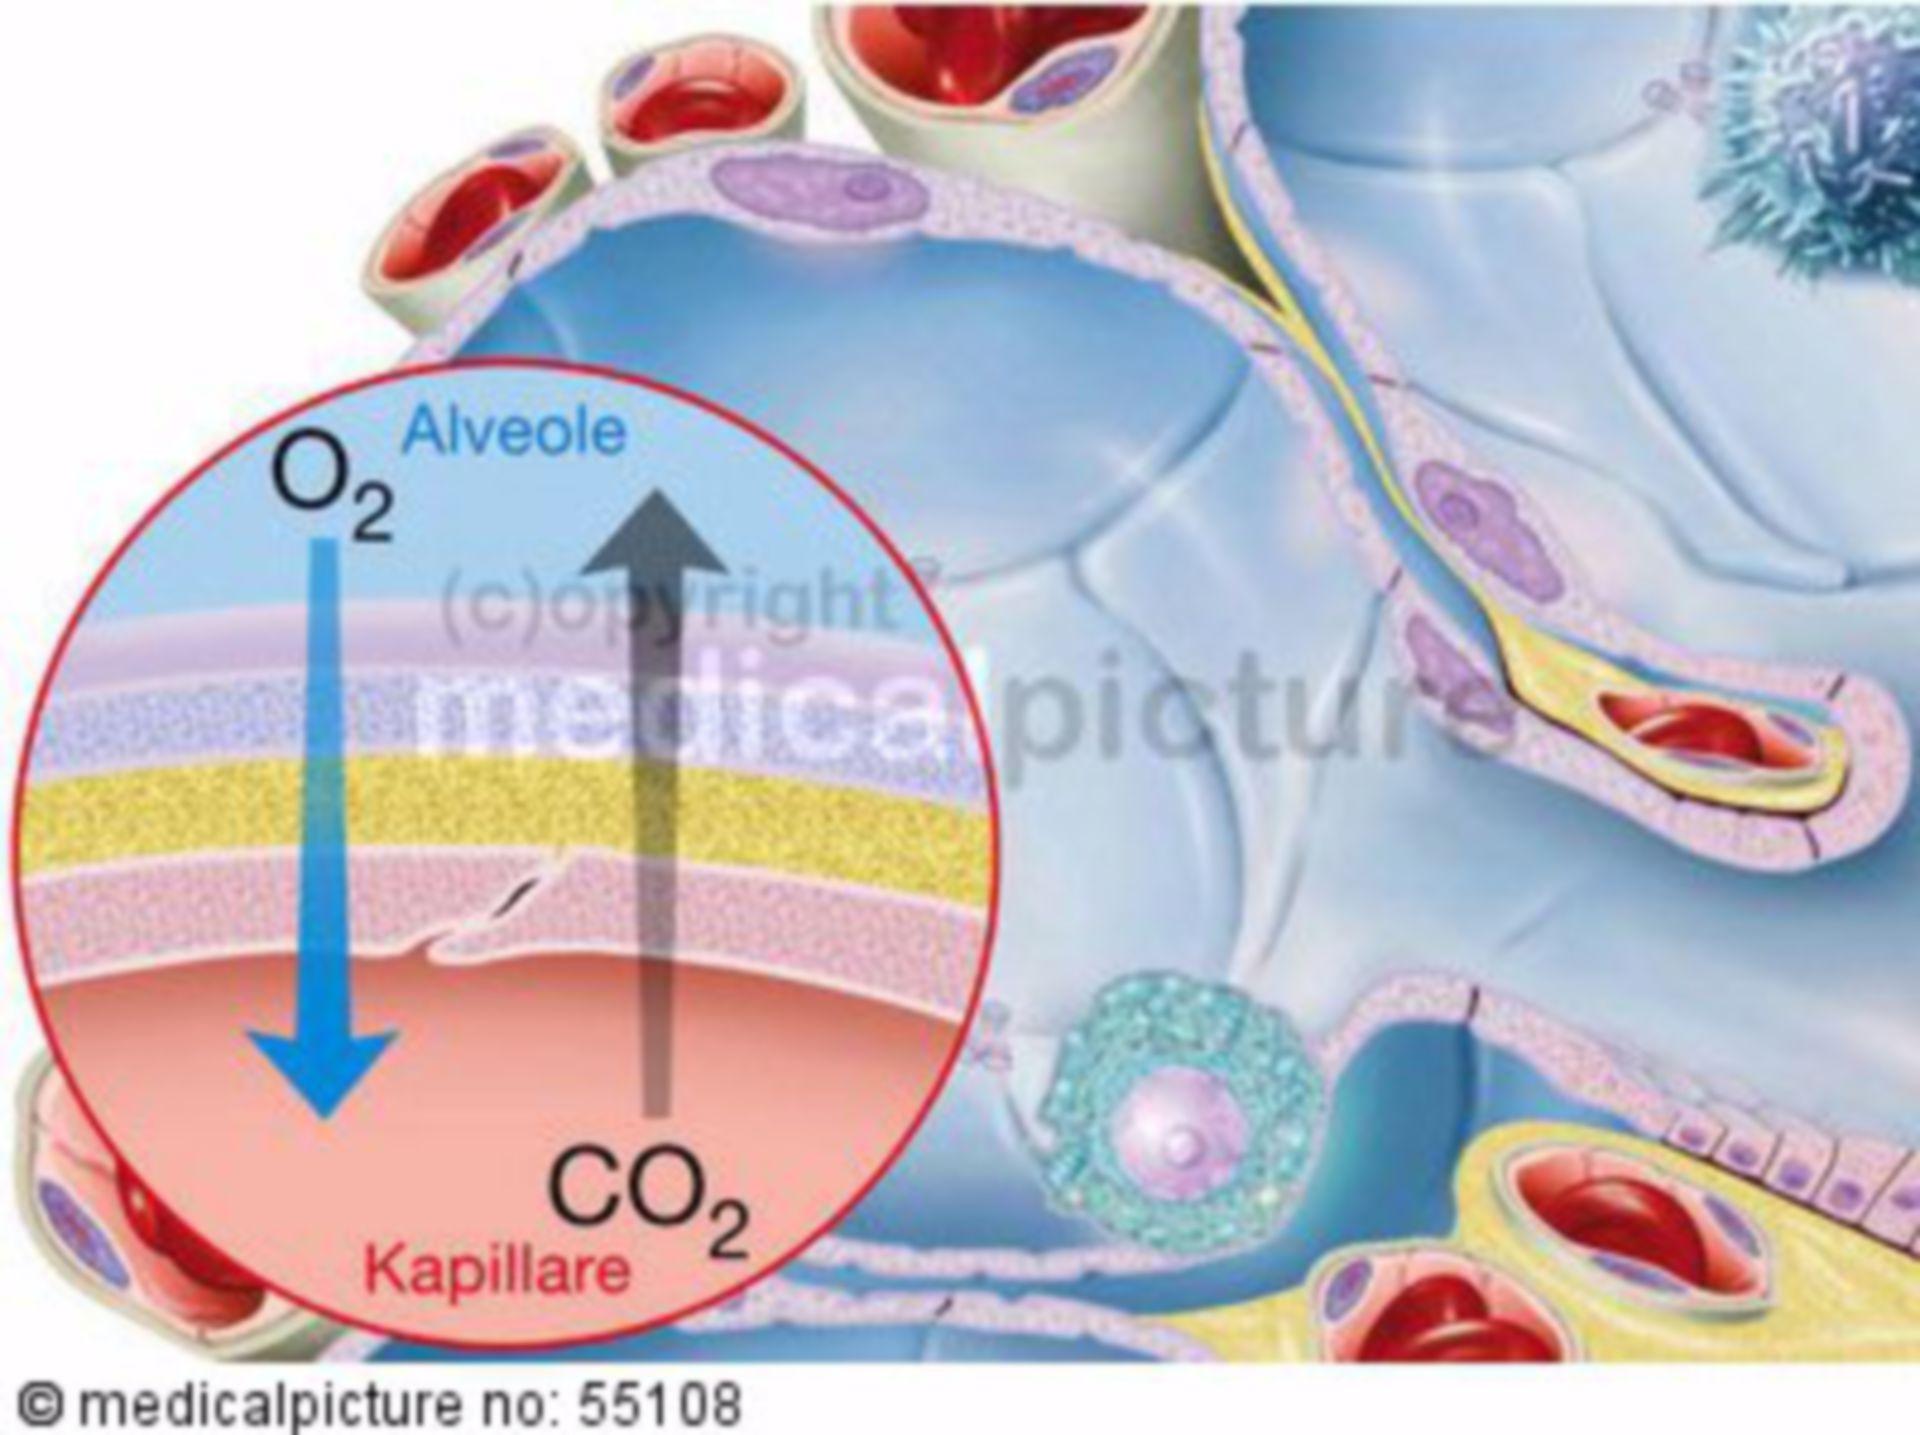 Exchange of substances in the alveoles